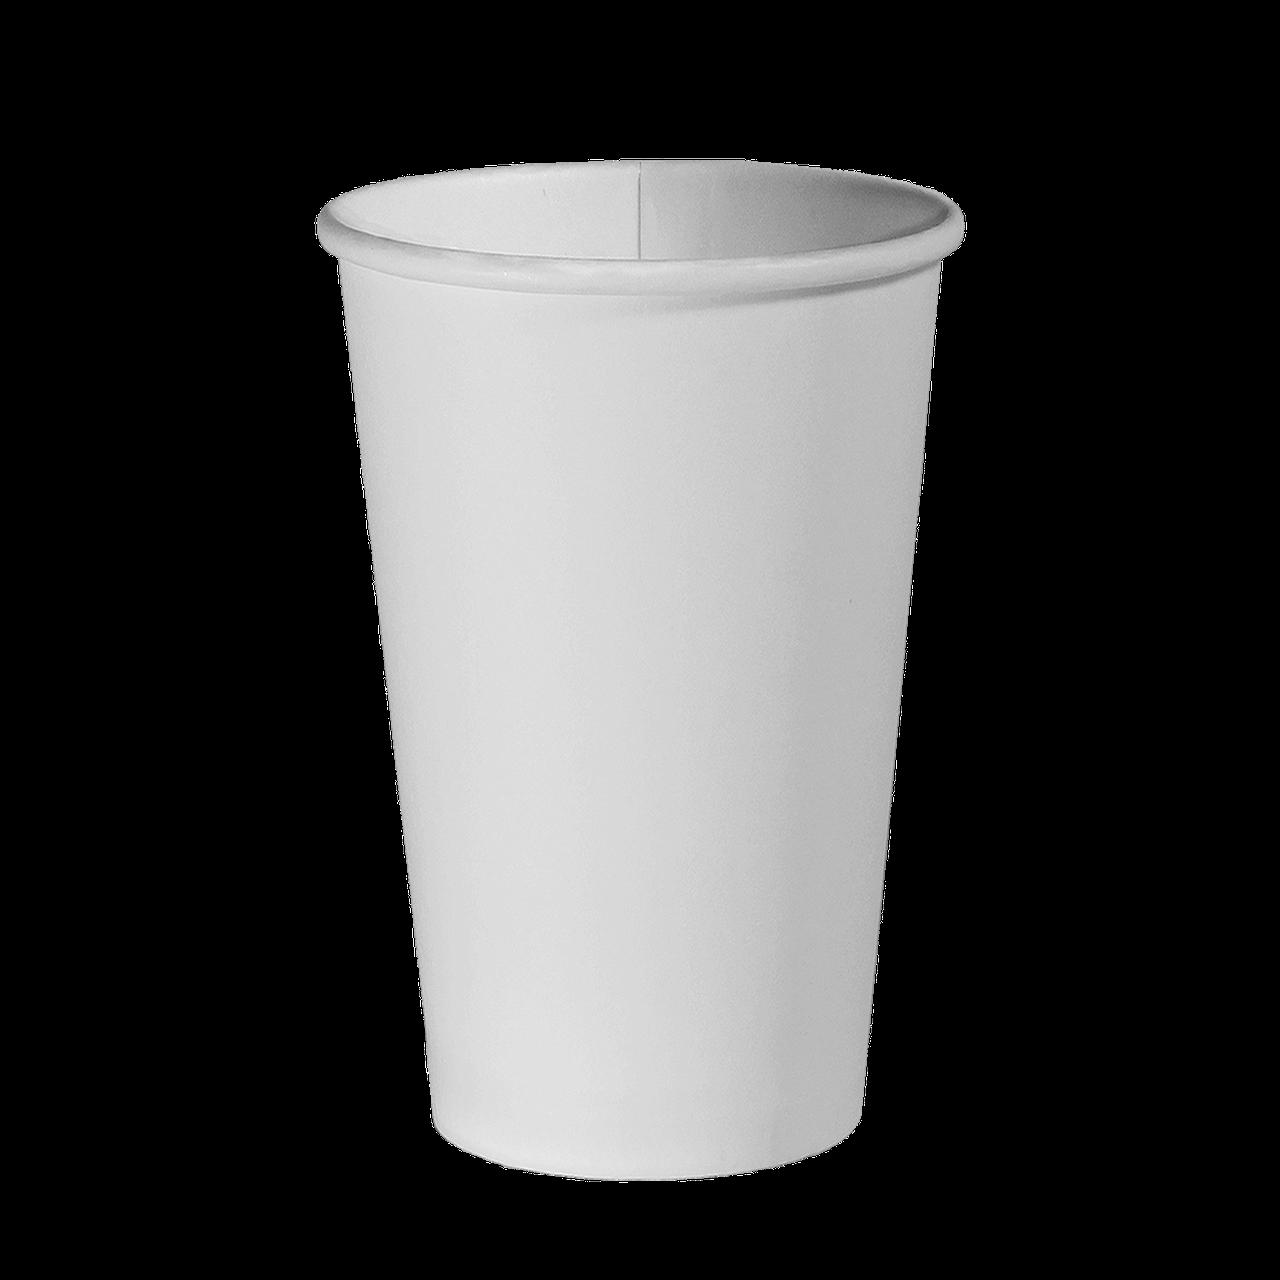 Стакан паперовий 400 мл. 50шт.уп. (20/1000) Білий